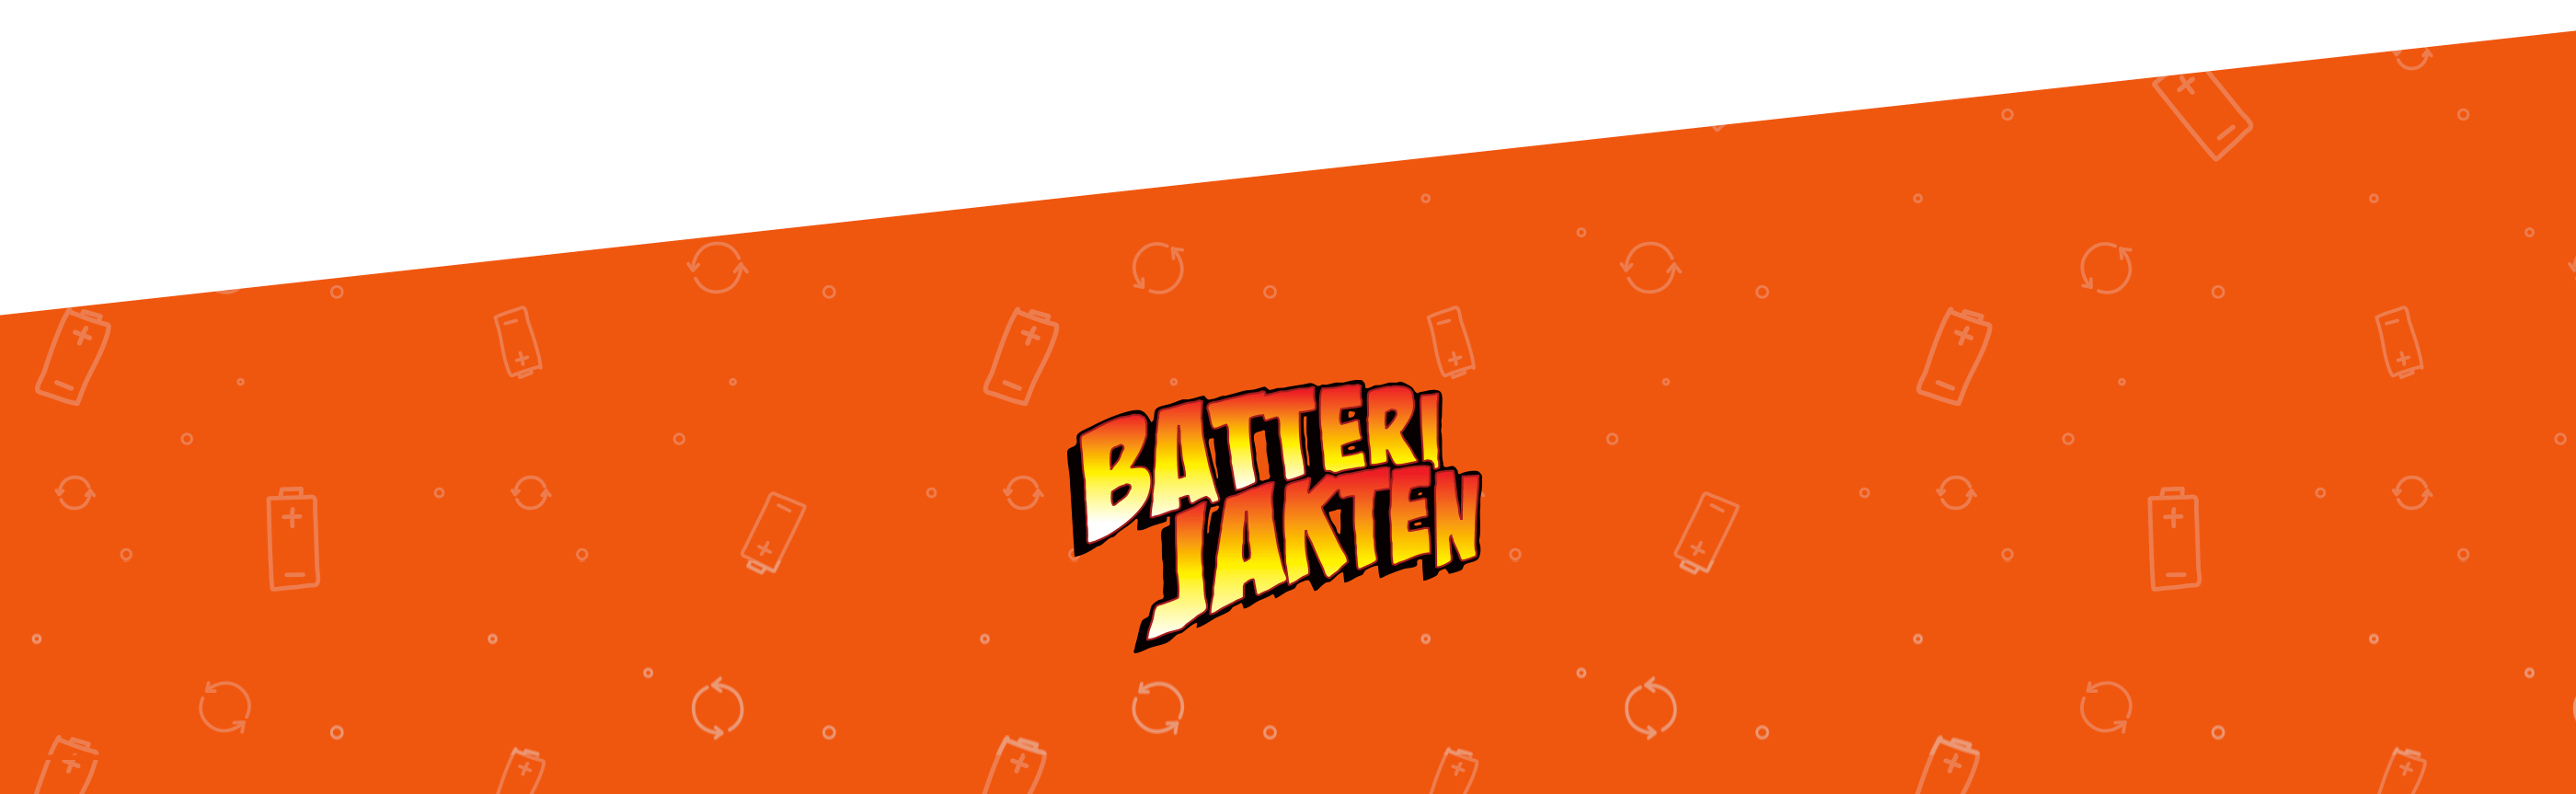 Batterijakten ingame assets